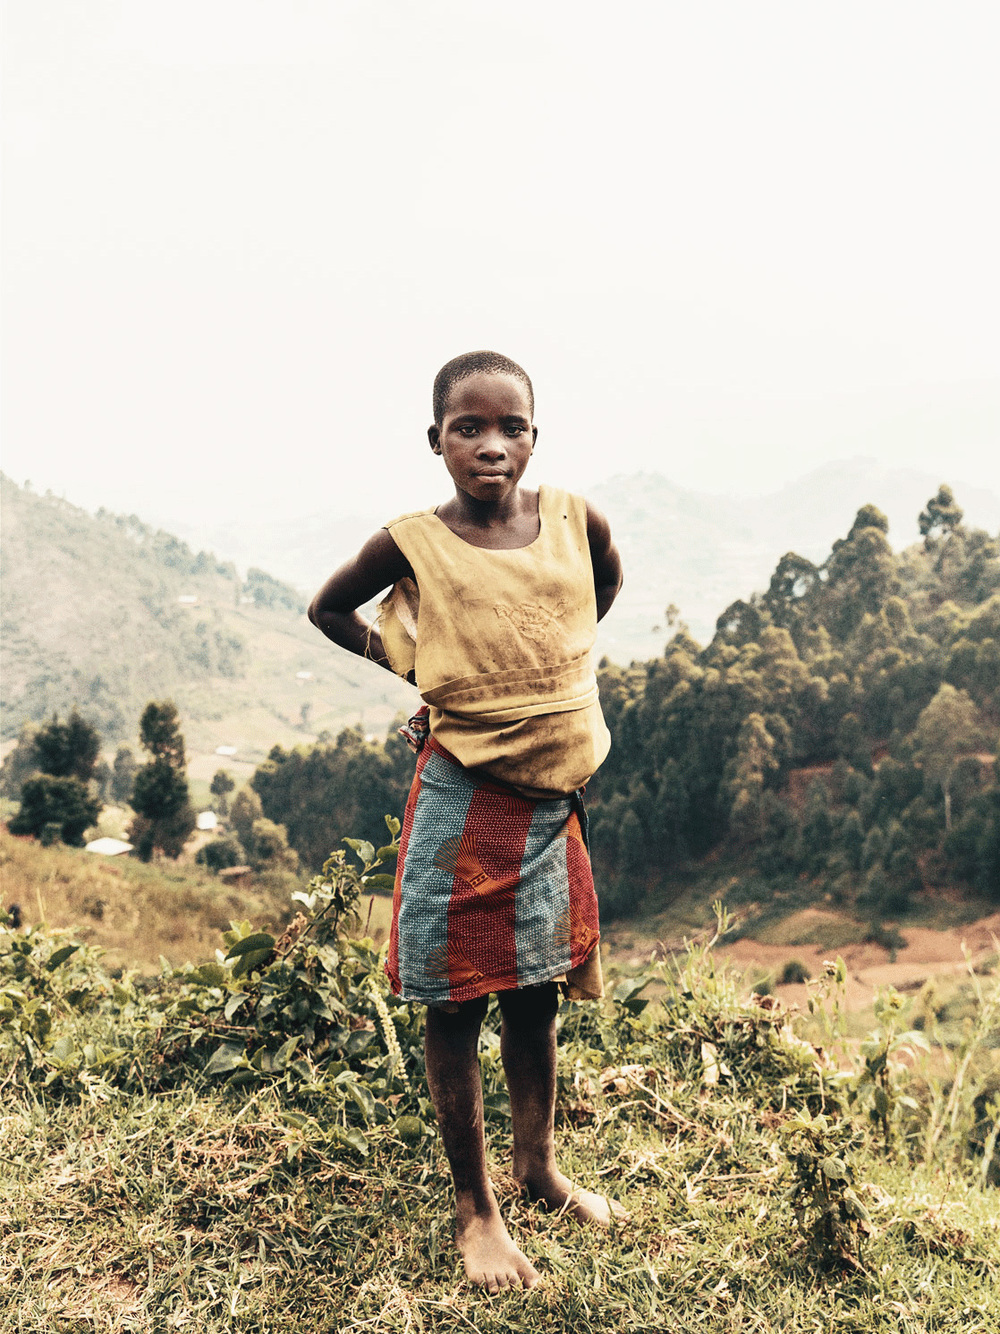 CallieGiovanna_Africa_Uganda_LakeBunyonyi_20150101_09444.jpg